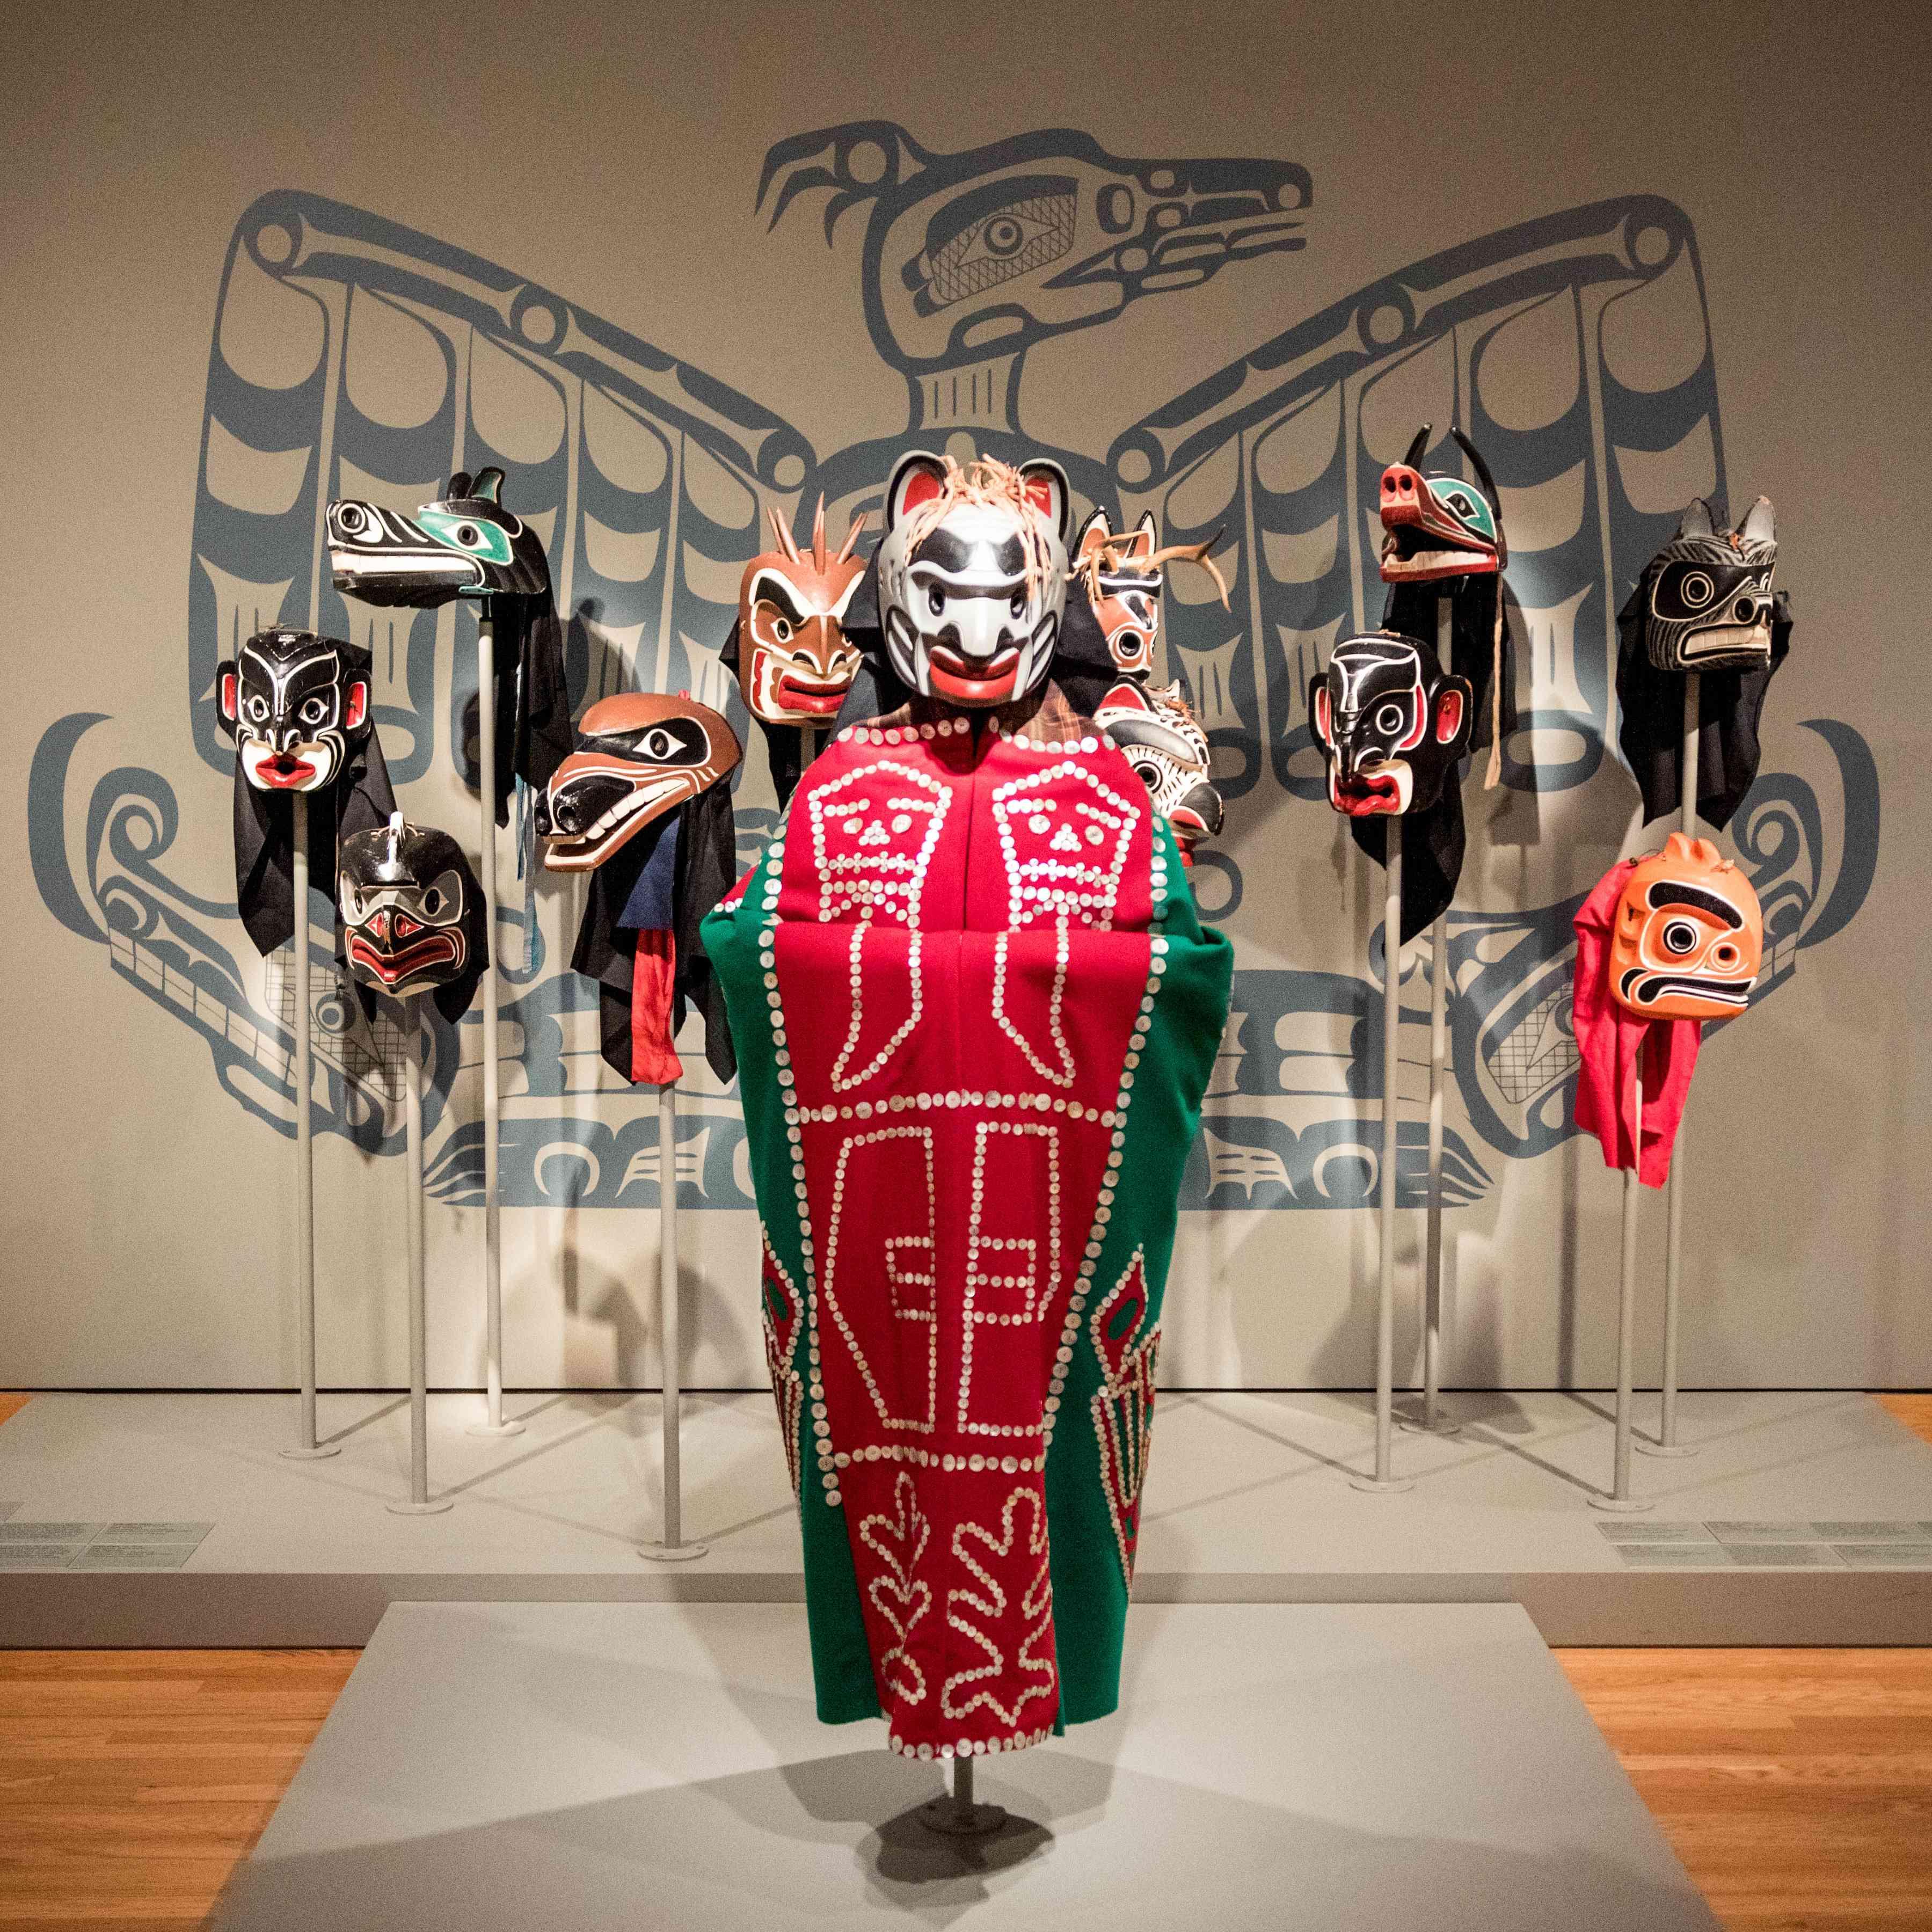 Seattle Art Museum in Washington